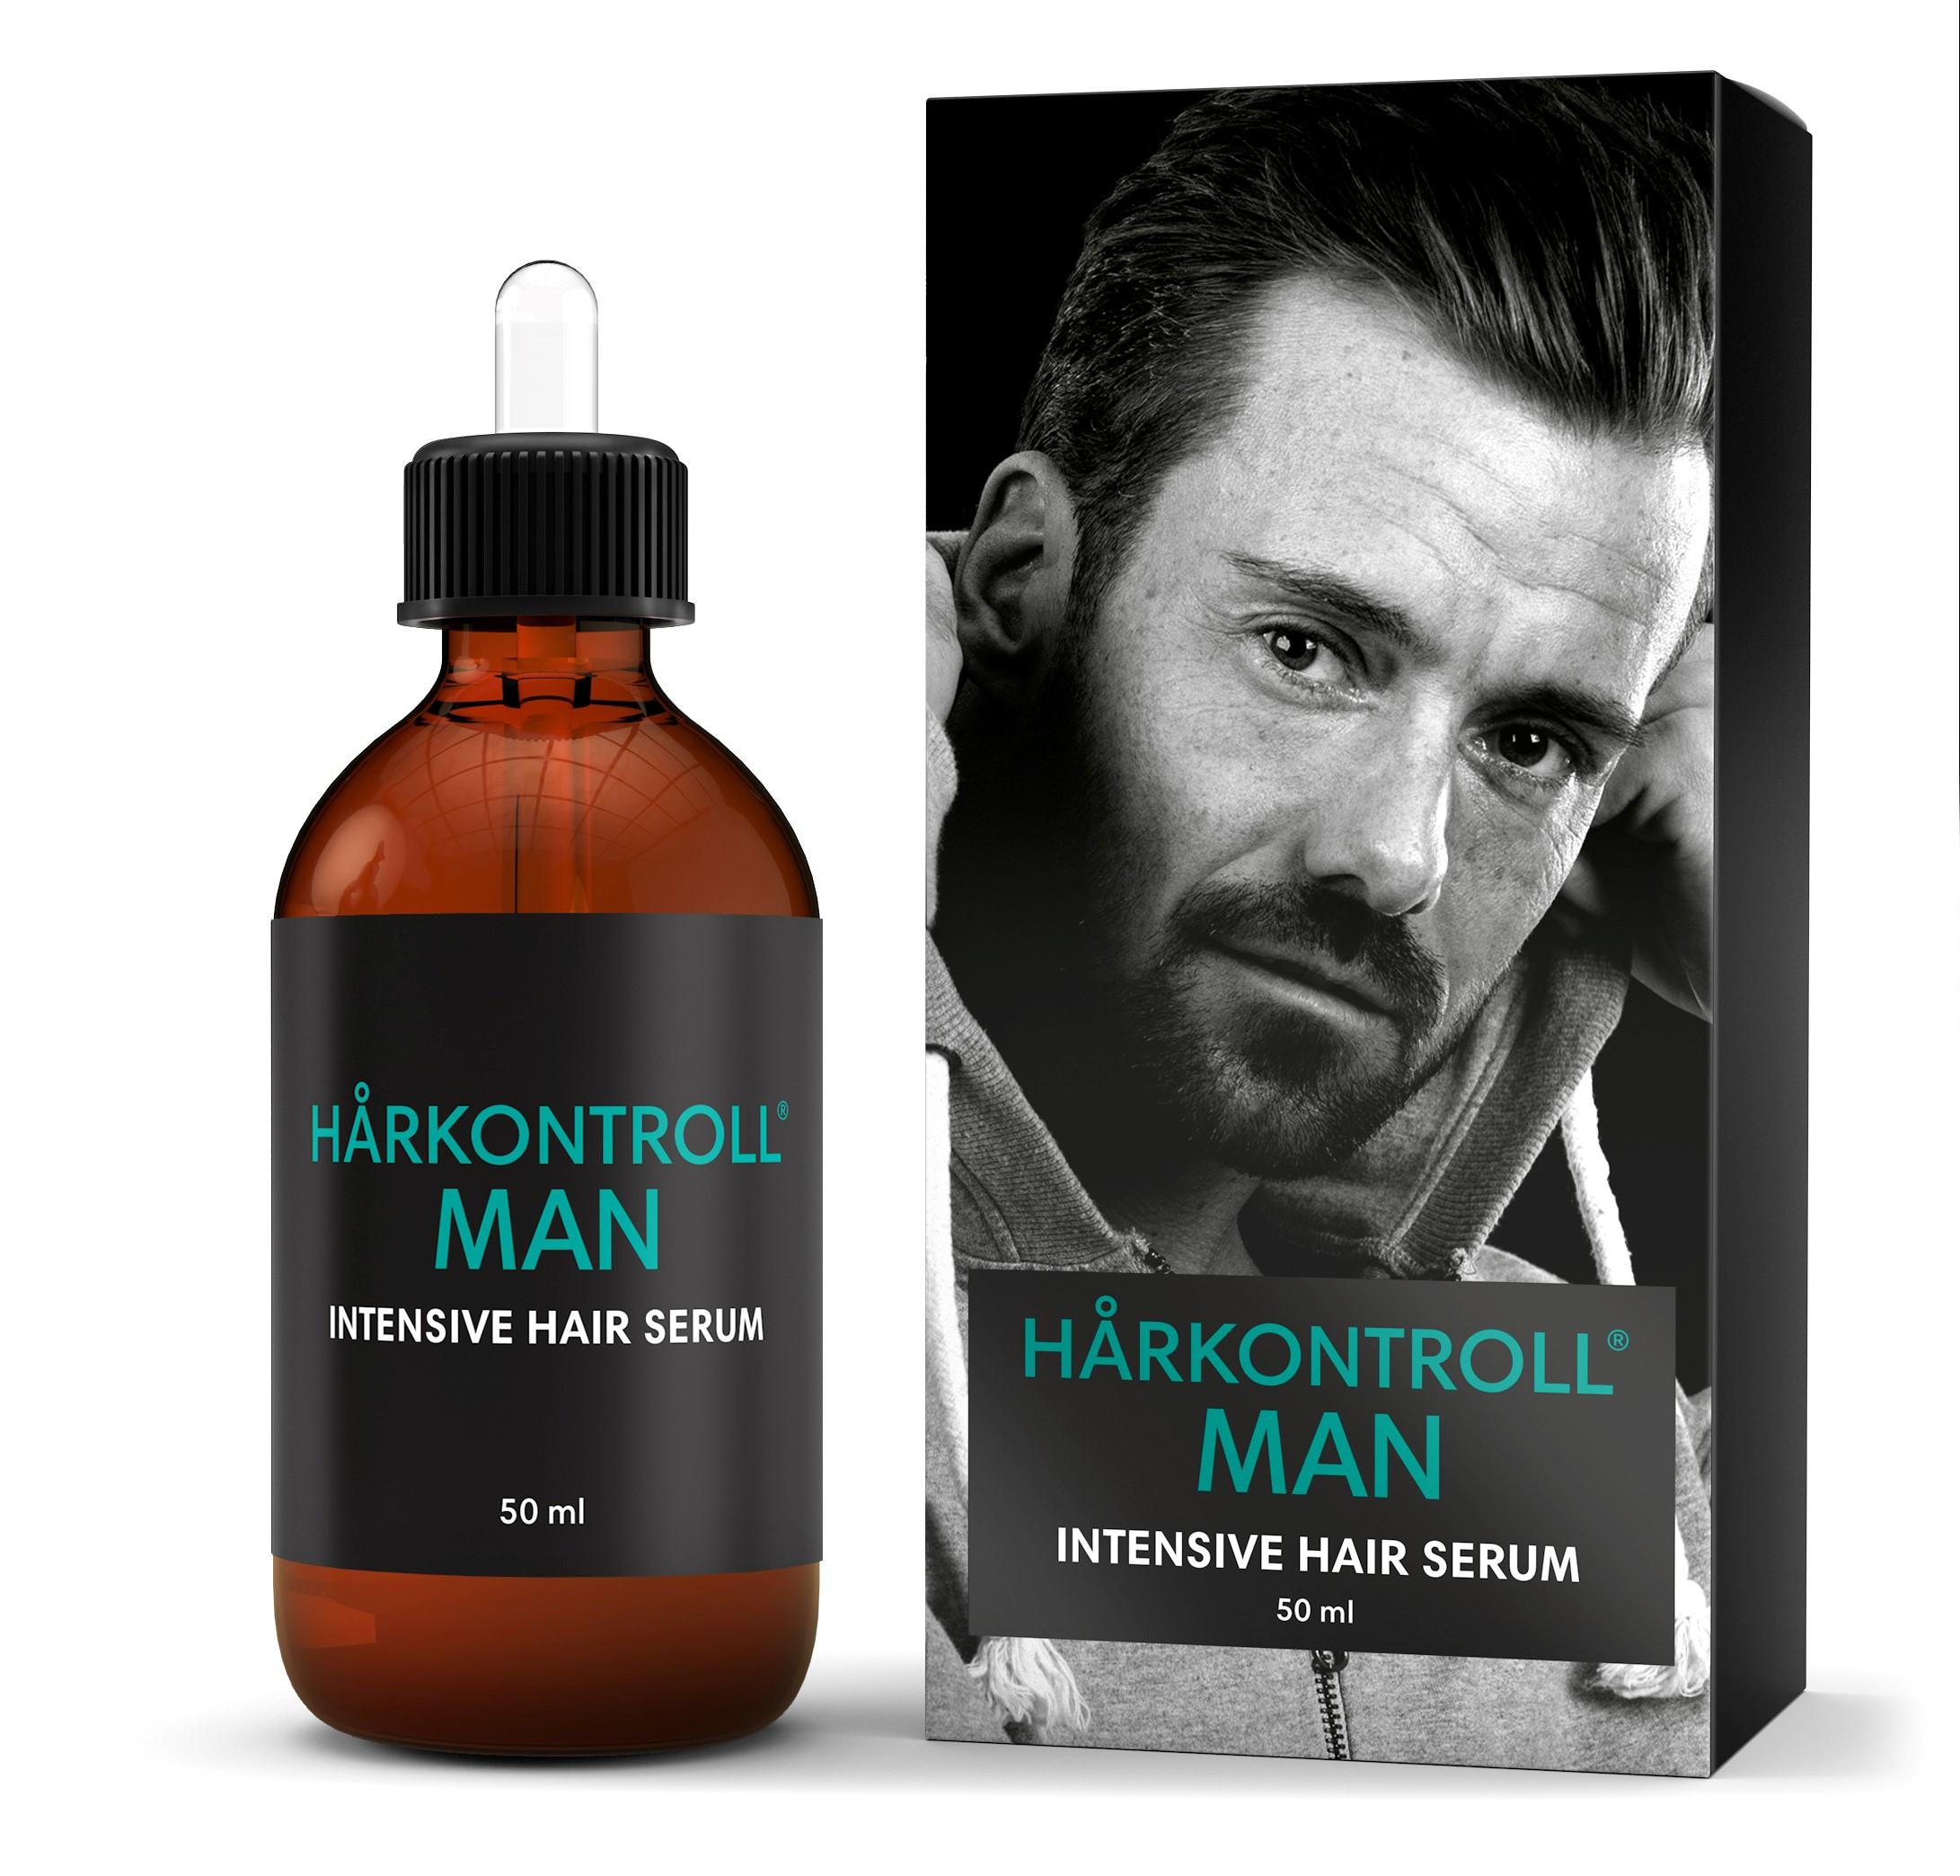 hårkontroll boost biverkningar